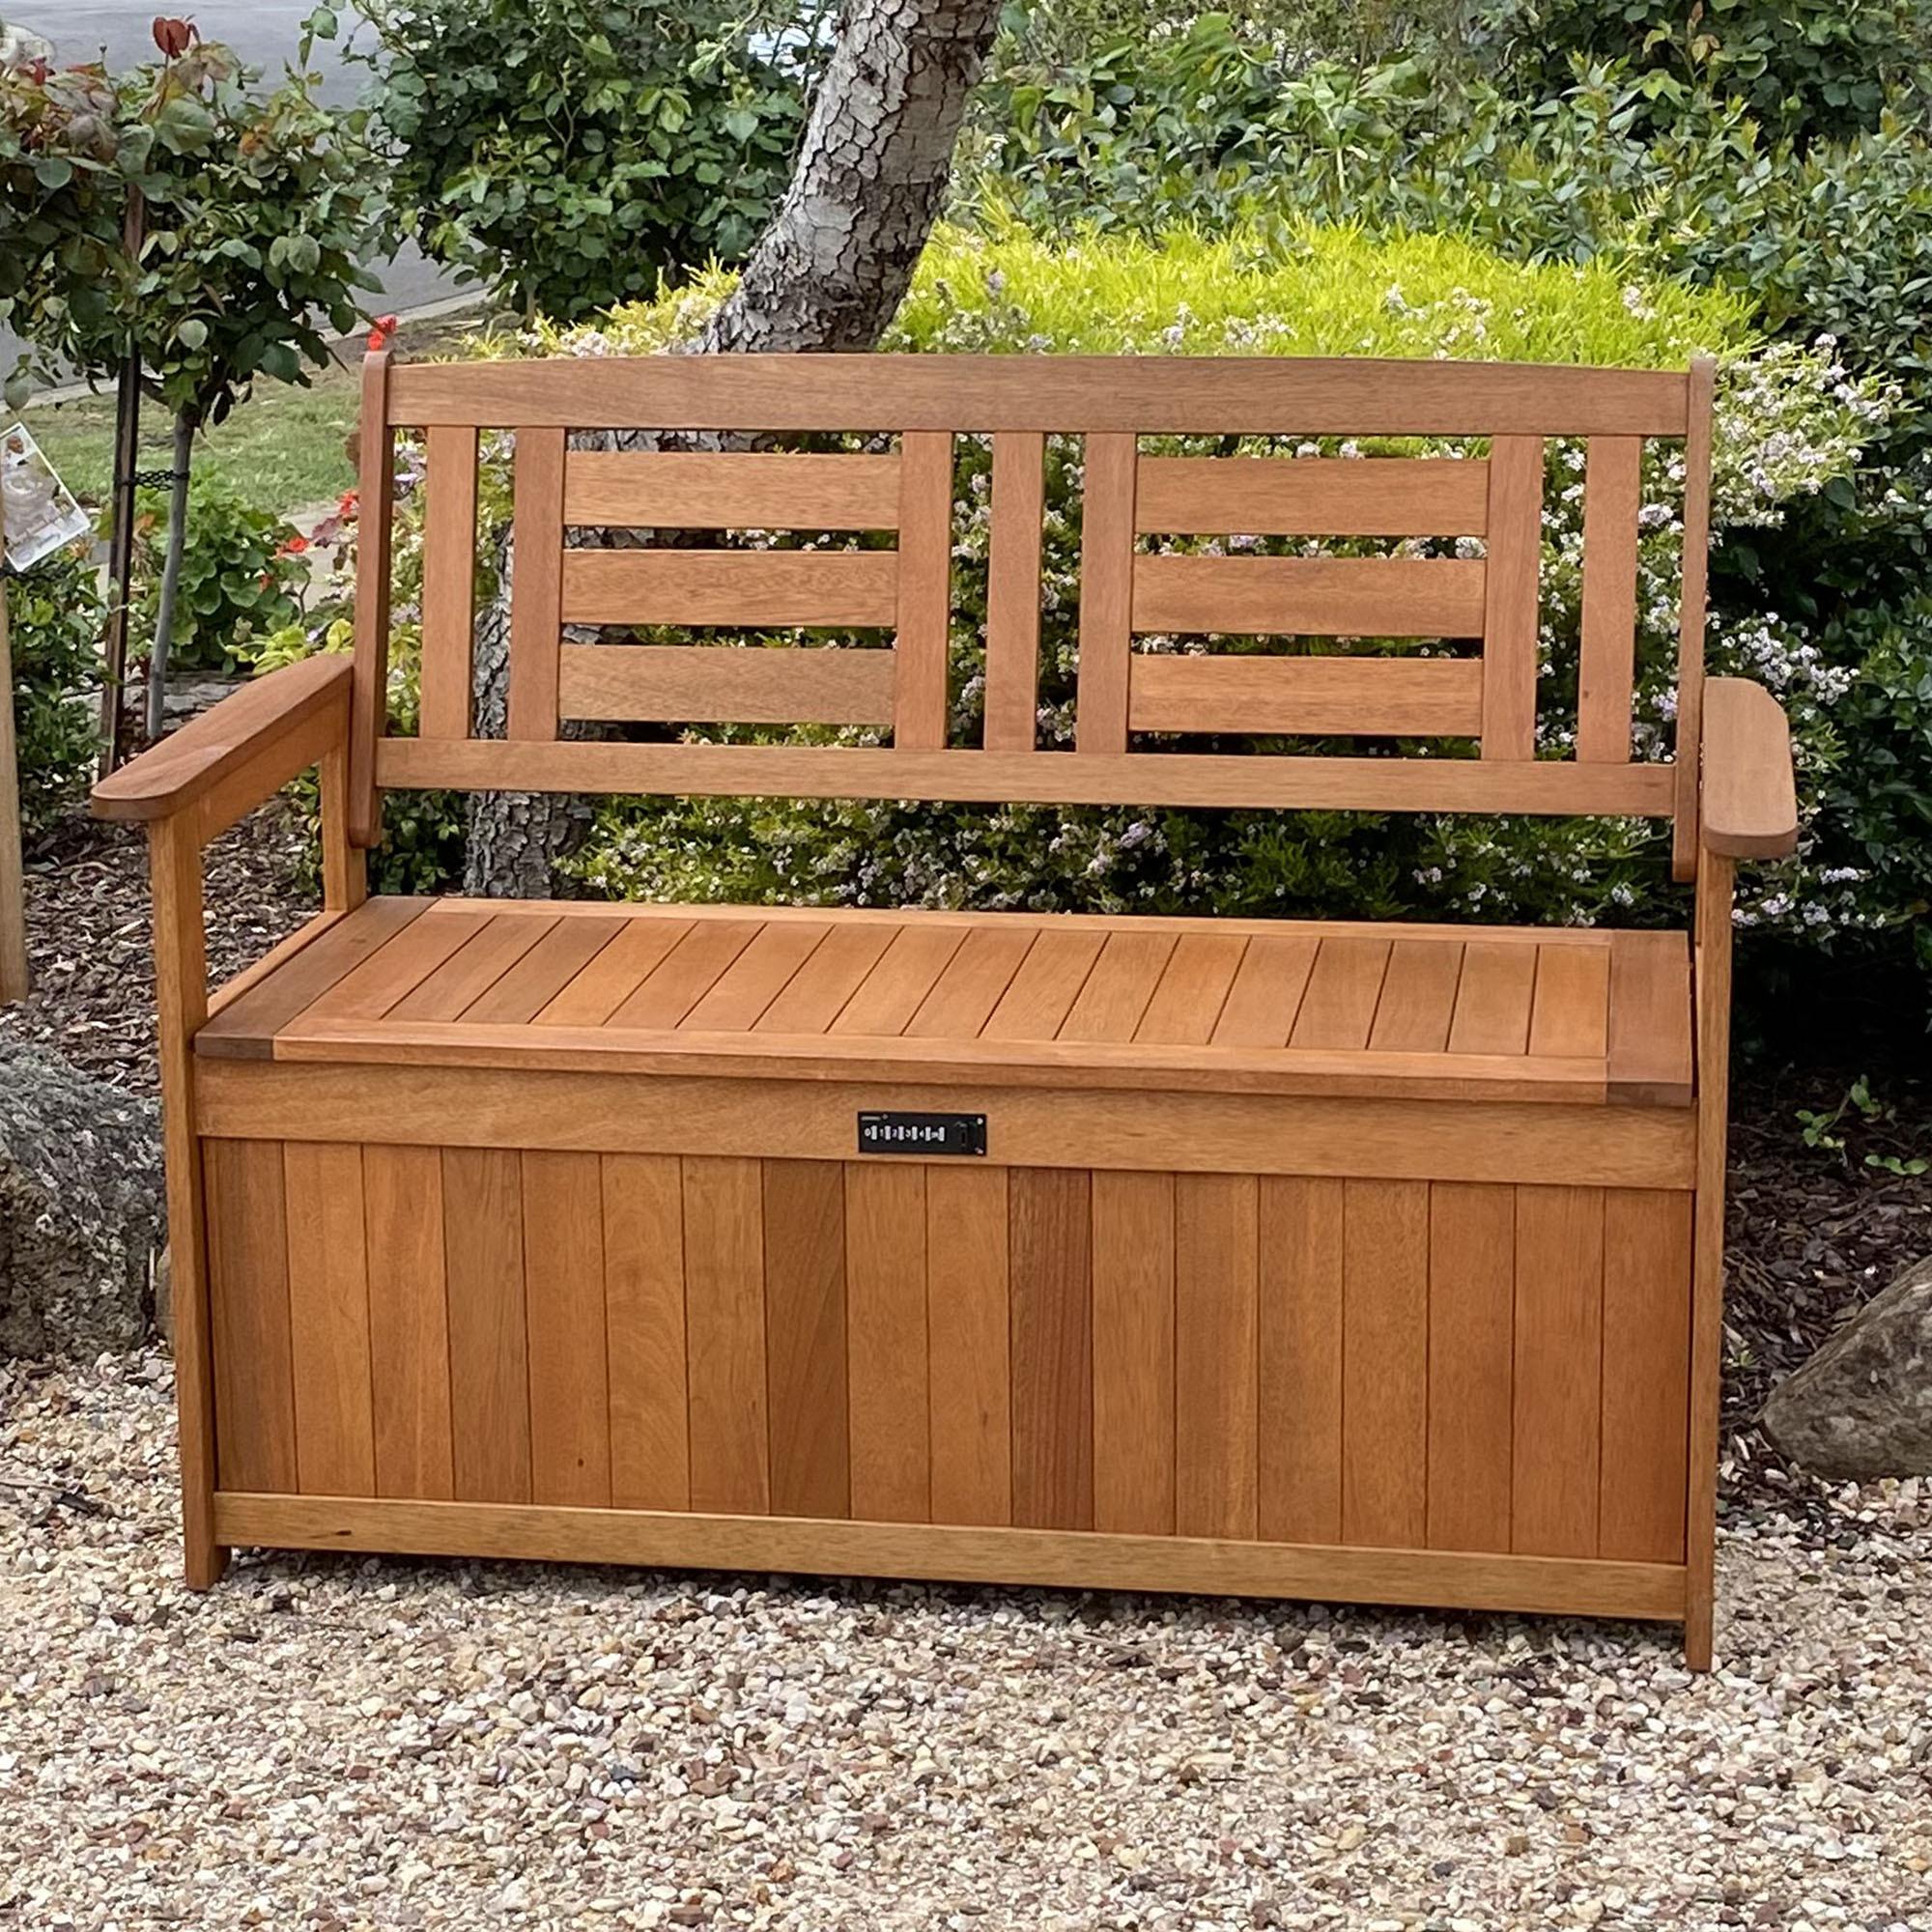 Breeze Outdoor Lockt Wooden, Wood Bench With Storage Outdoor